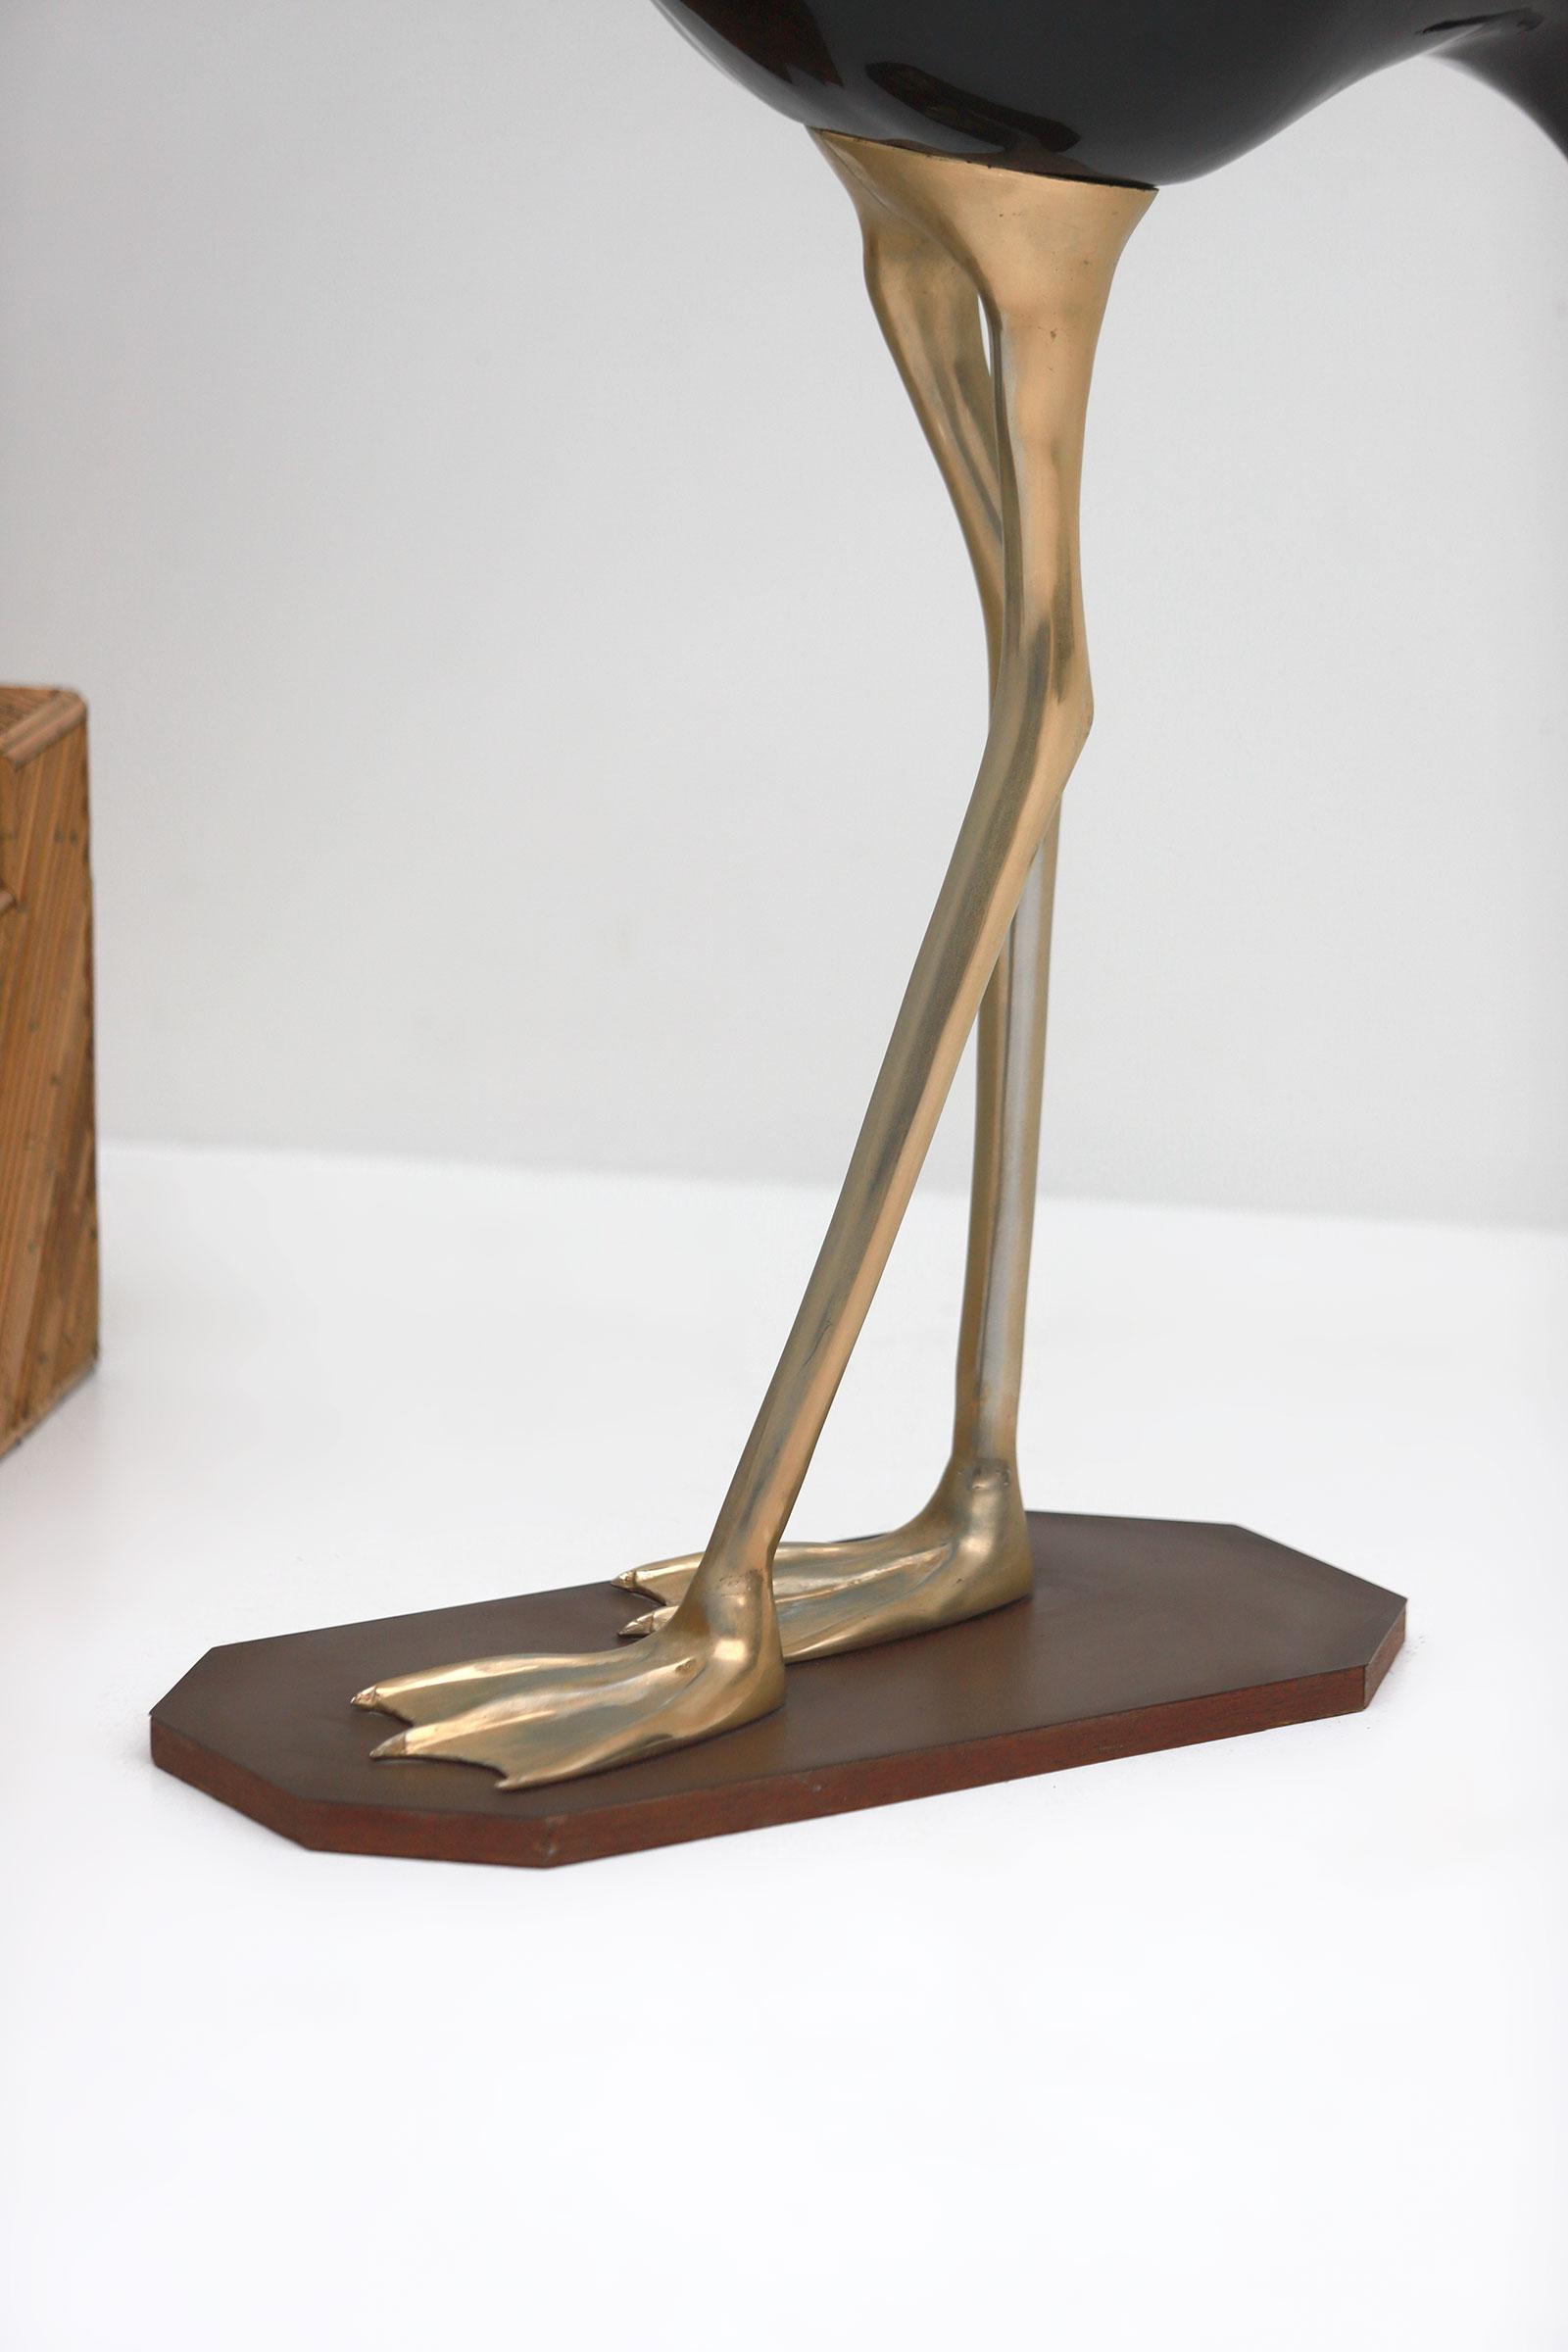 Fondica Lifesize Brass Flamingo 1970simage 15